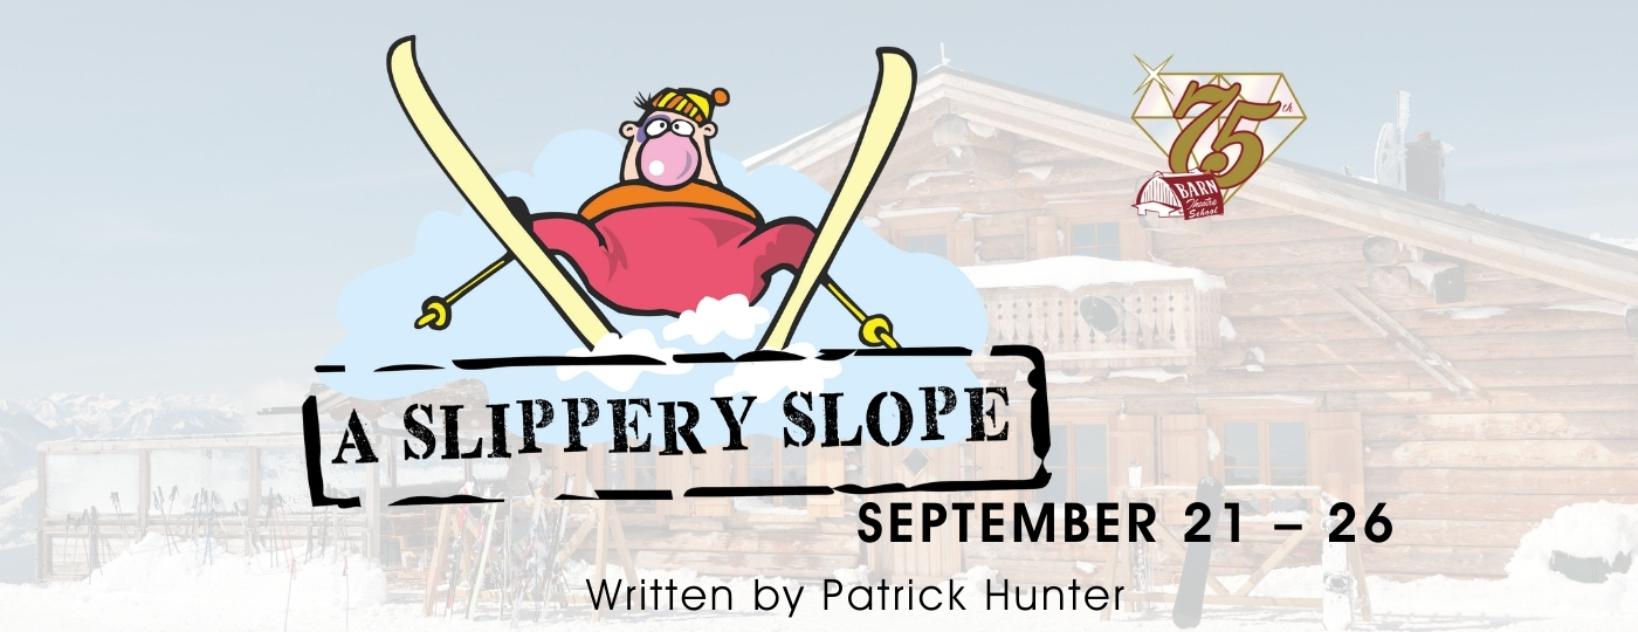 A slippery slope web slider